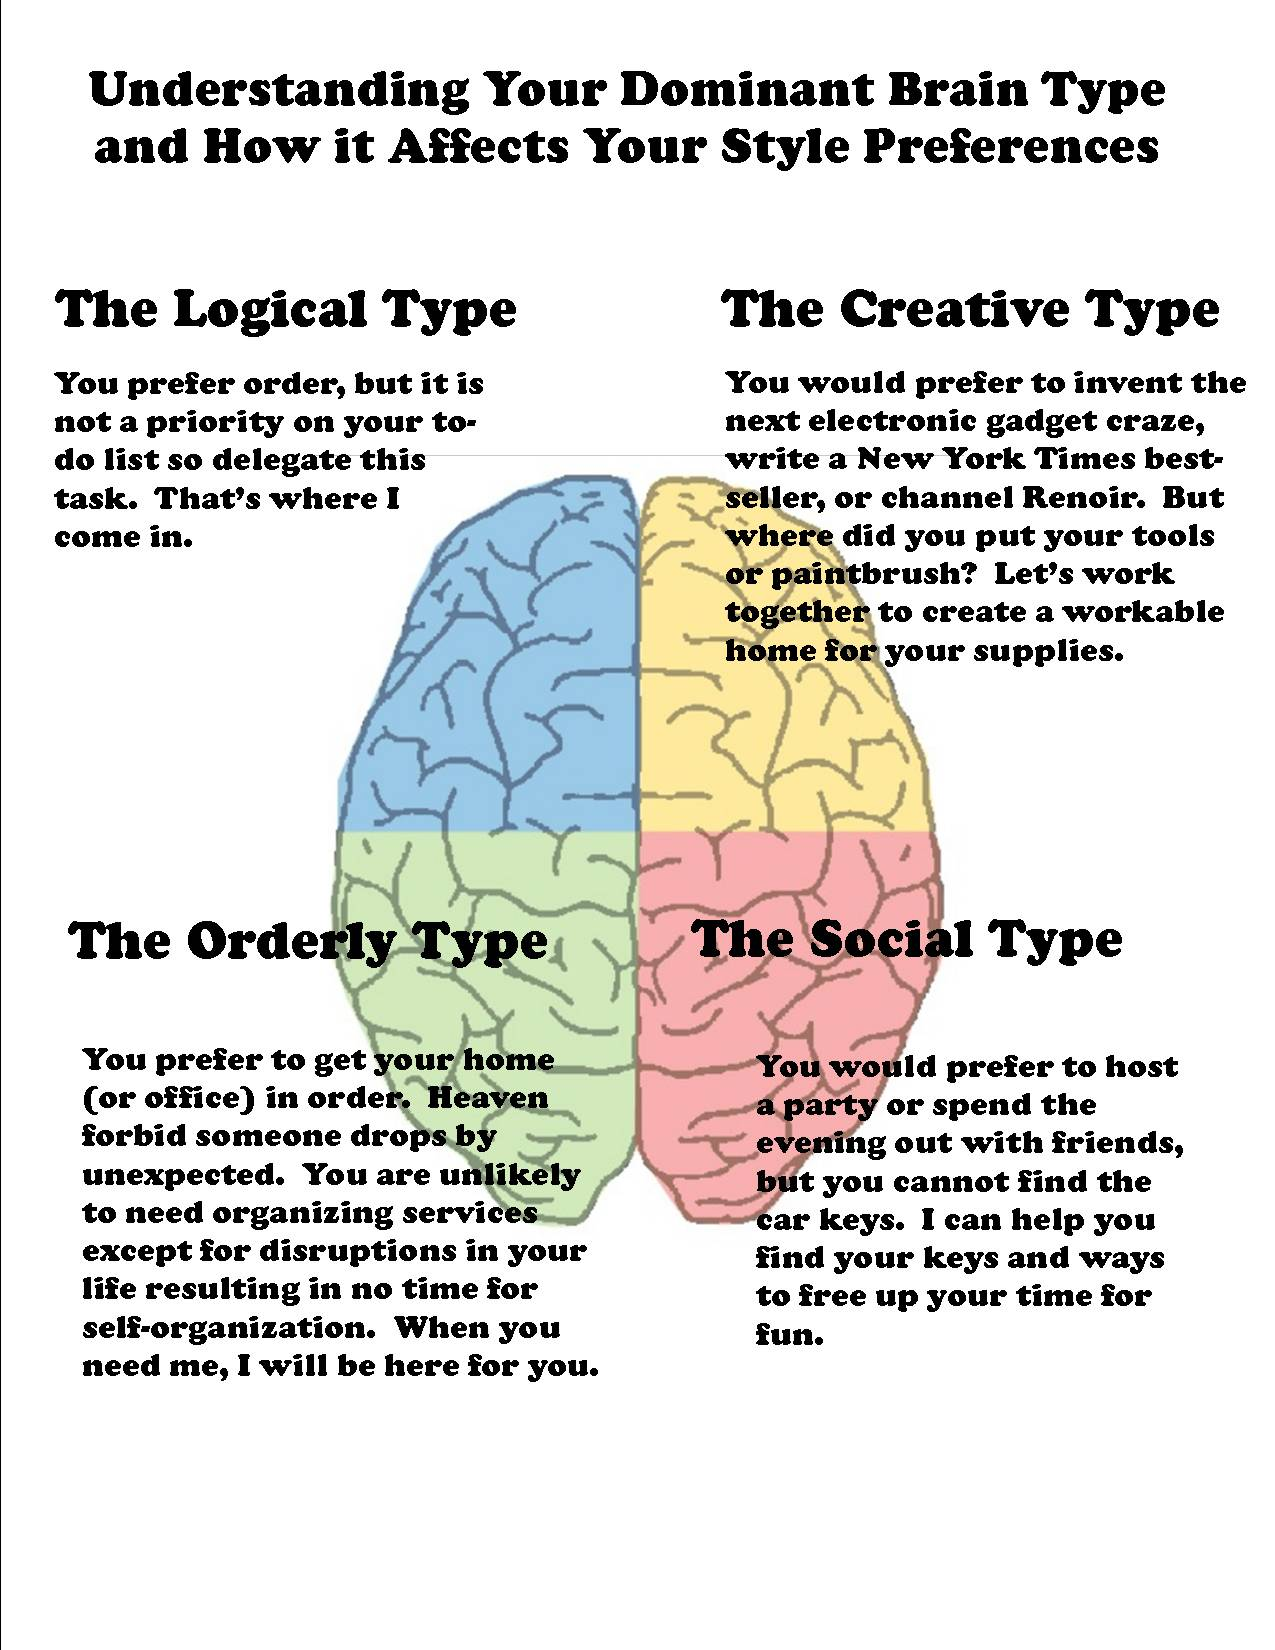 brain type.jpg